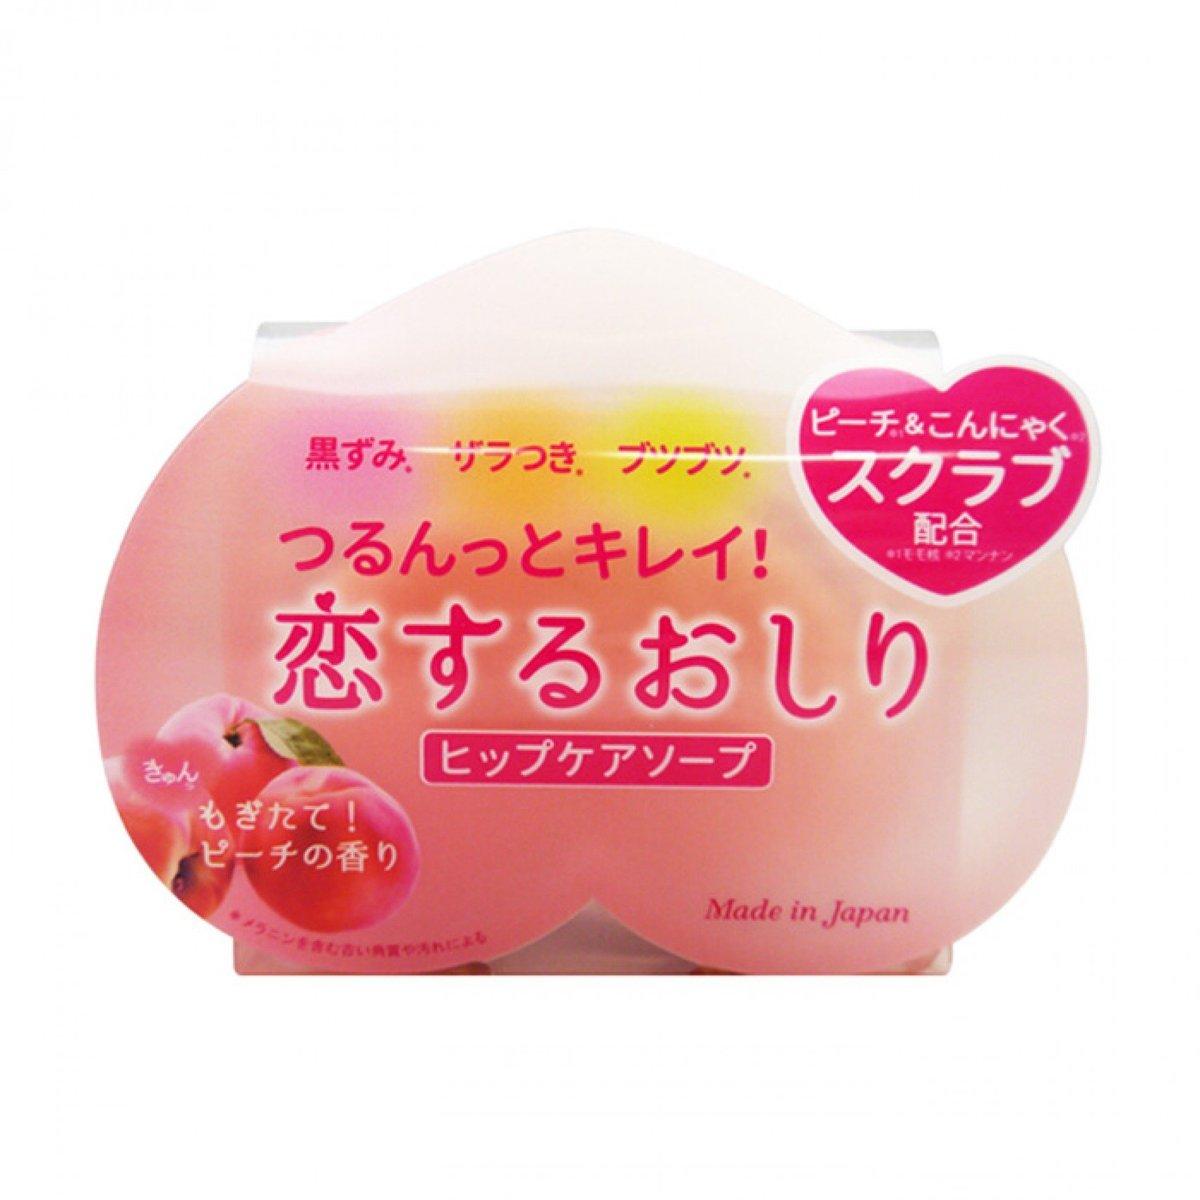 Pelican 沛麗康 蒟蒻臀部PP 去角質保濕蜜桃皂 80g (全身可用淡化黑色素) 粉膠盒